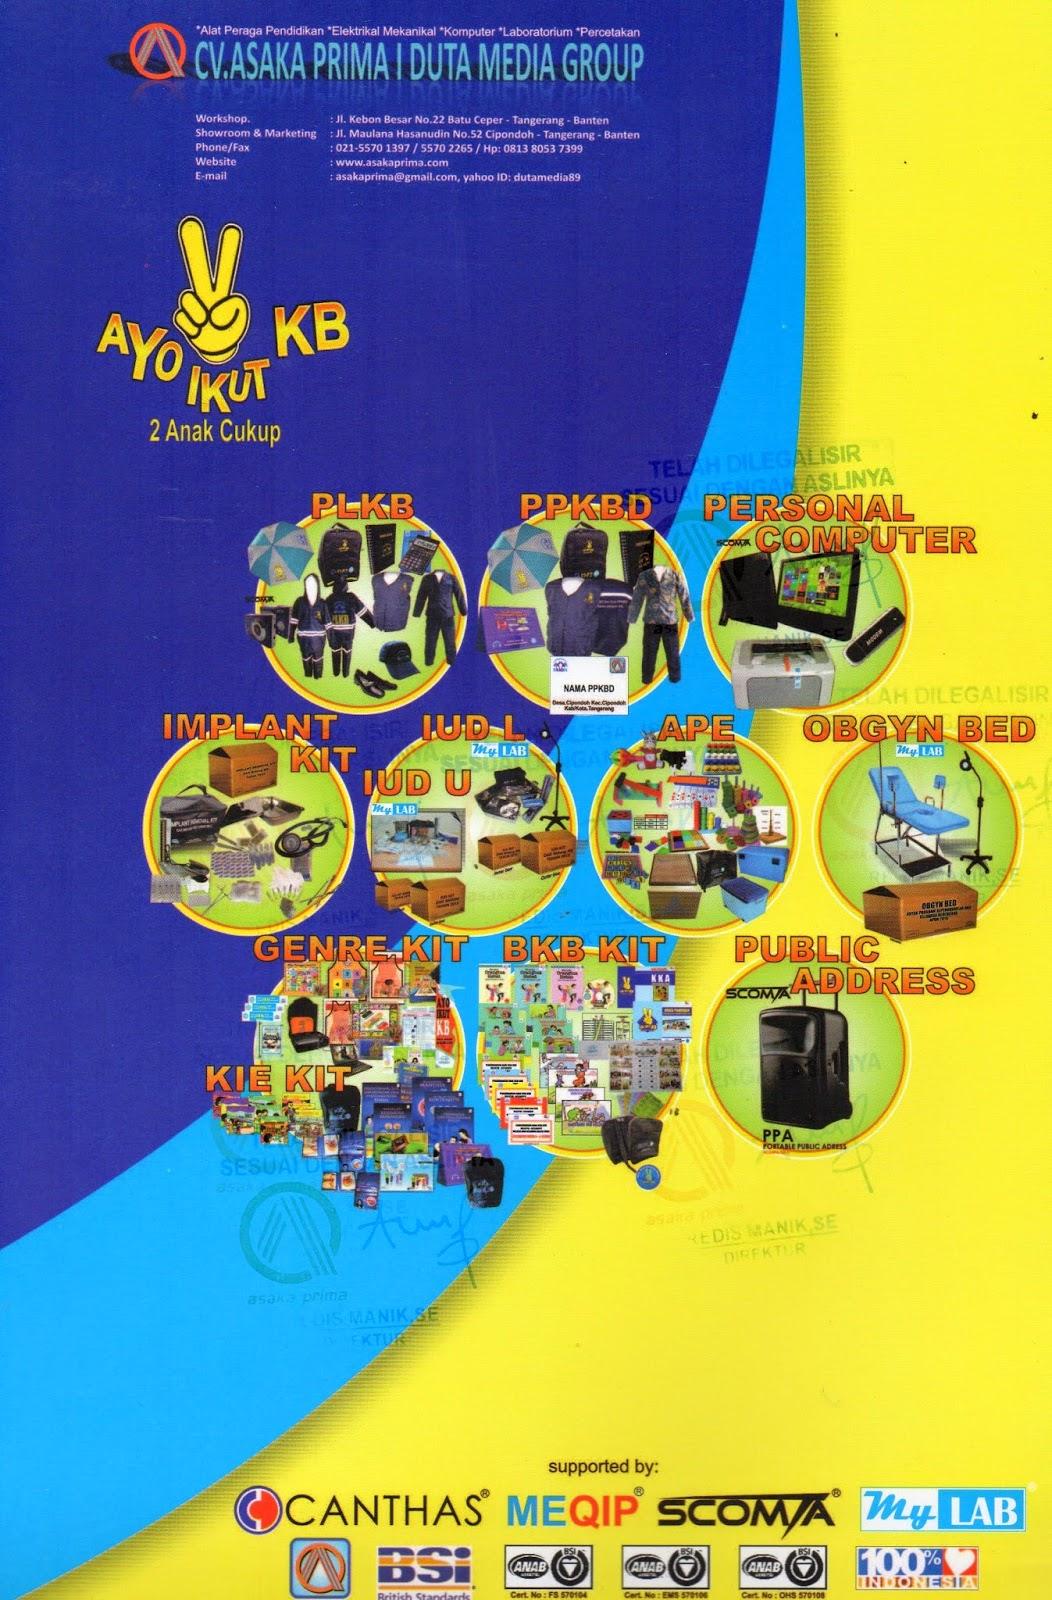 JUKNIS DAK BKKBN 2015,BKB KIT,KIE KIT,OBGYN BED,OBGYN BED BKKBN 2015,SARANA PLKB.PPKBD/Sub PPKBD , BKKBN 2015 - GenRe Kit 2015 - Obgyn Bed 2015 - Iud Kit 2015 - Kie Kit 2015 - Implant Kit 2015- Sarana PLKB  2015- BKB Kit 2015 - Public Address 2015 - Desktop PC bkkBn 2015, Ape Kit Bkkbn 2015, bkb kit bkkbn 2015, Desktop Pc Bkkbn 2015, Genre Kit BKKBN 2015, iud kit bkkbn 2015, kie kit bkkbn 2015, Mupen Kb Bkkbn 2015, Muyan Kb Bkkbn 2015, Obgyn Bed Bkkbn 2015, produk dak bkkbn 2015, Public Addres Bkkbn 2015, Sarana Plkb Bkkbn 2015